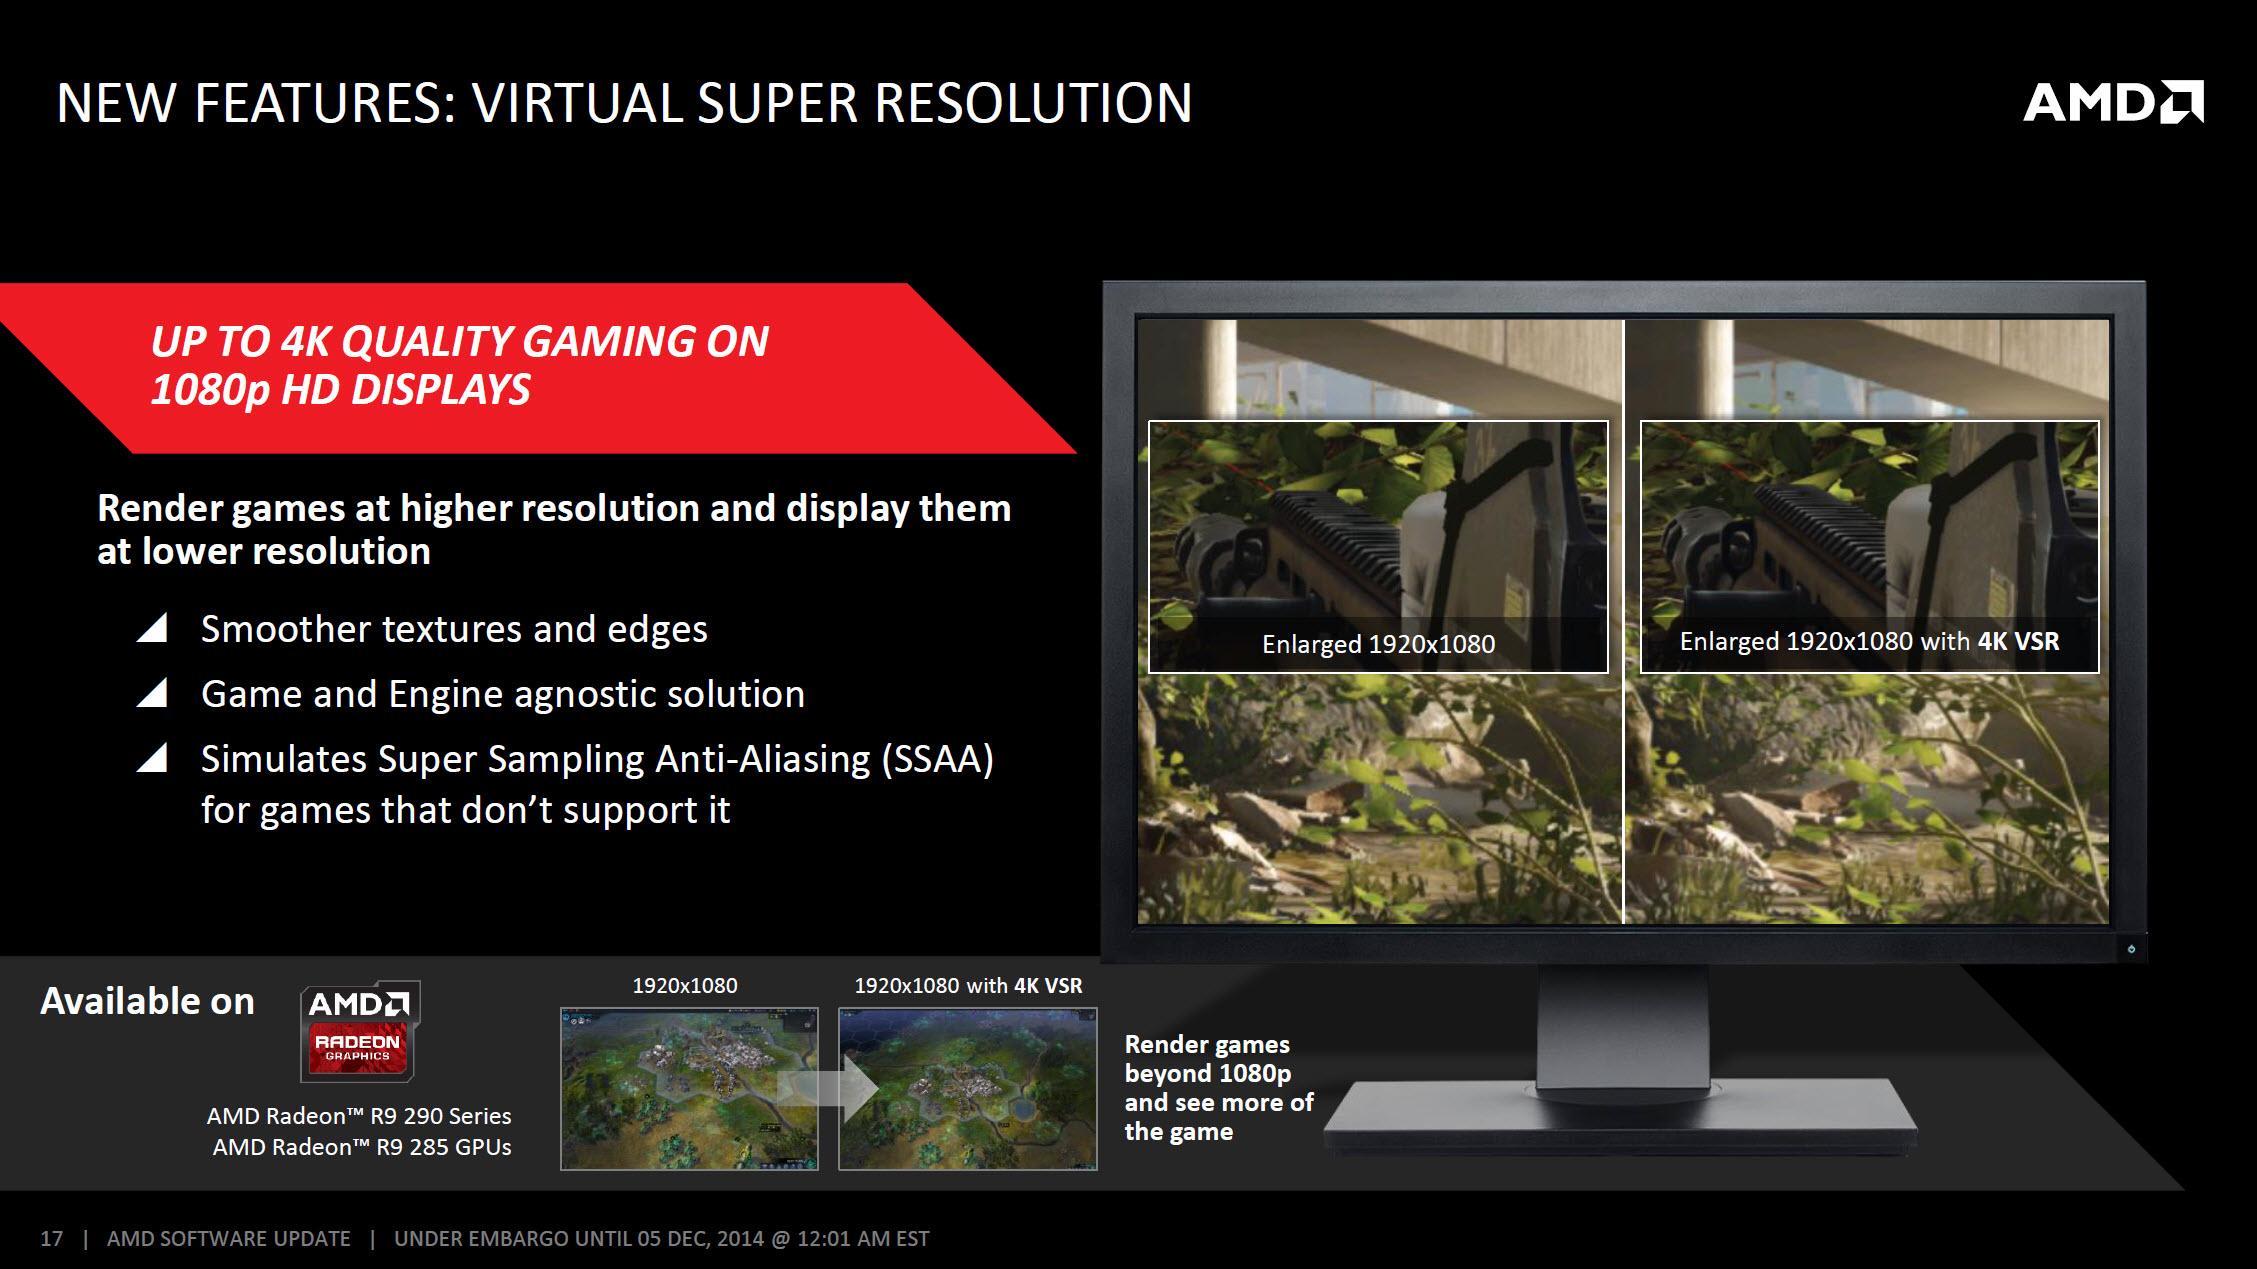 AMD CATALYST RAGE PERFORMANCE DISPLAY DRIVERS PC